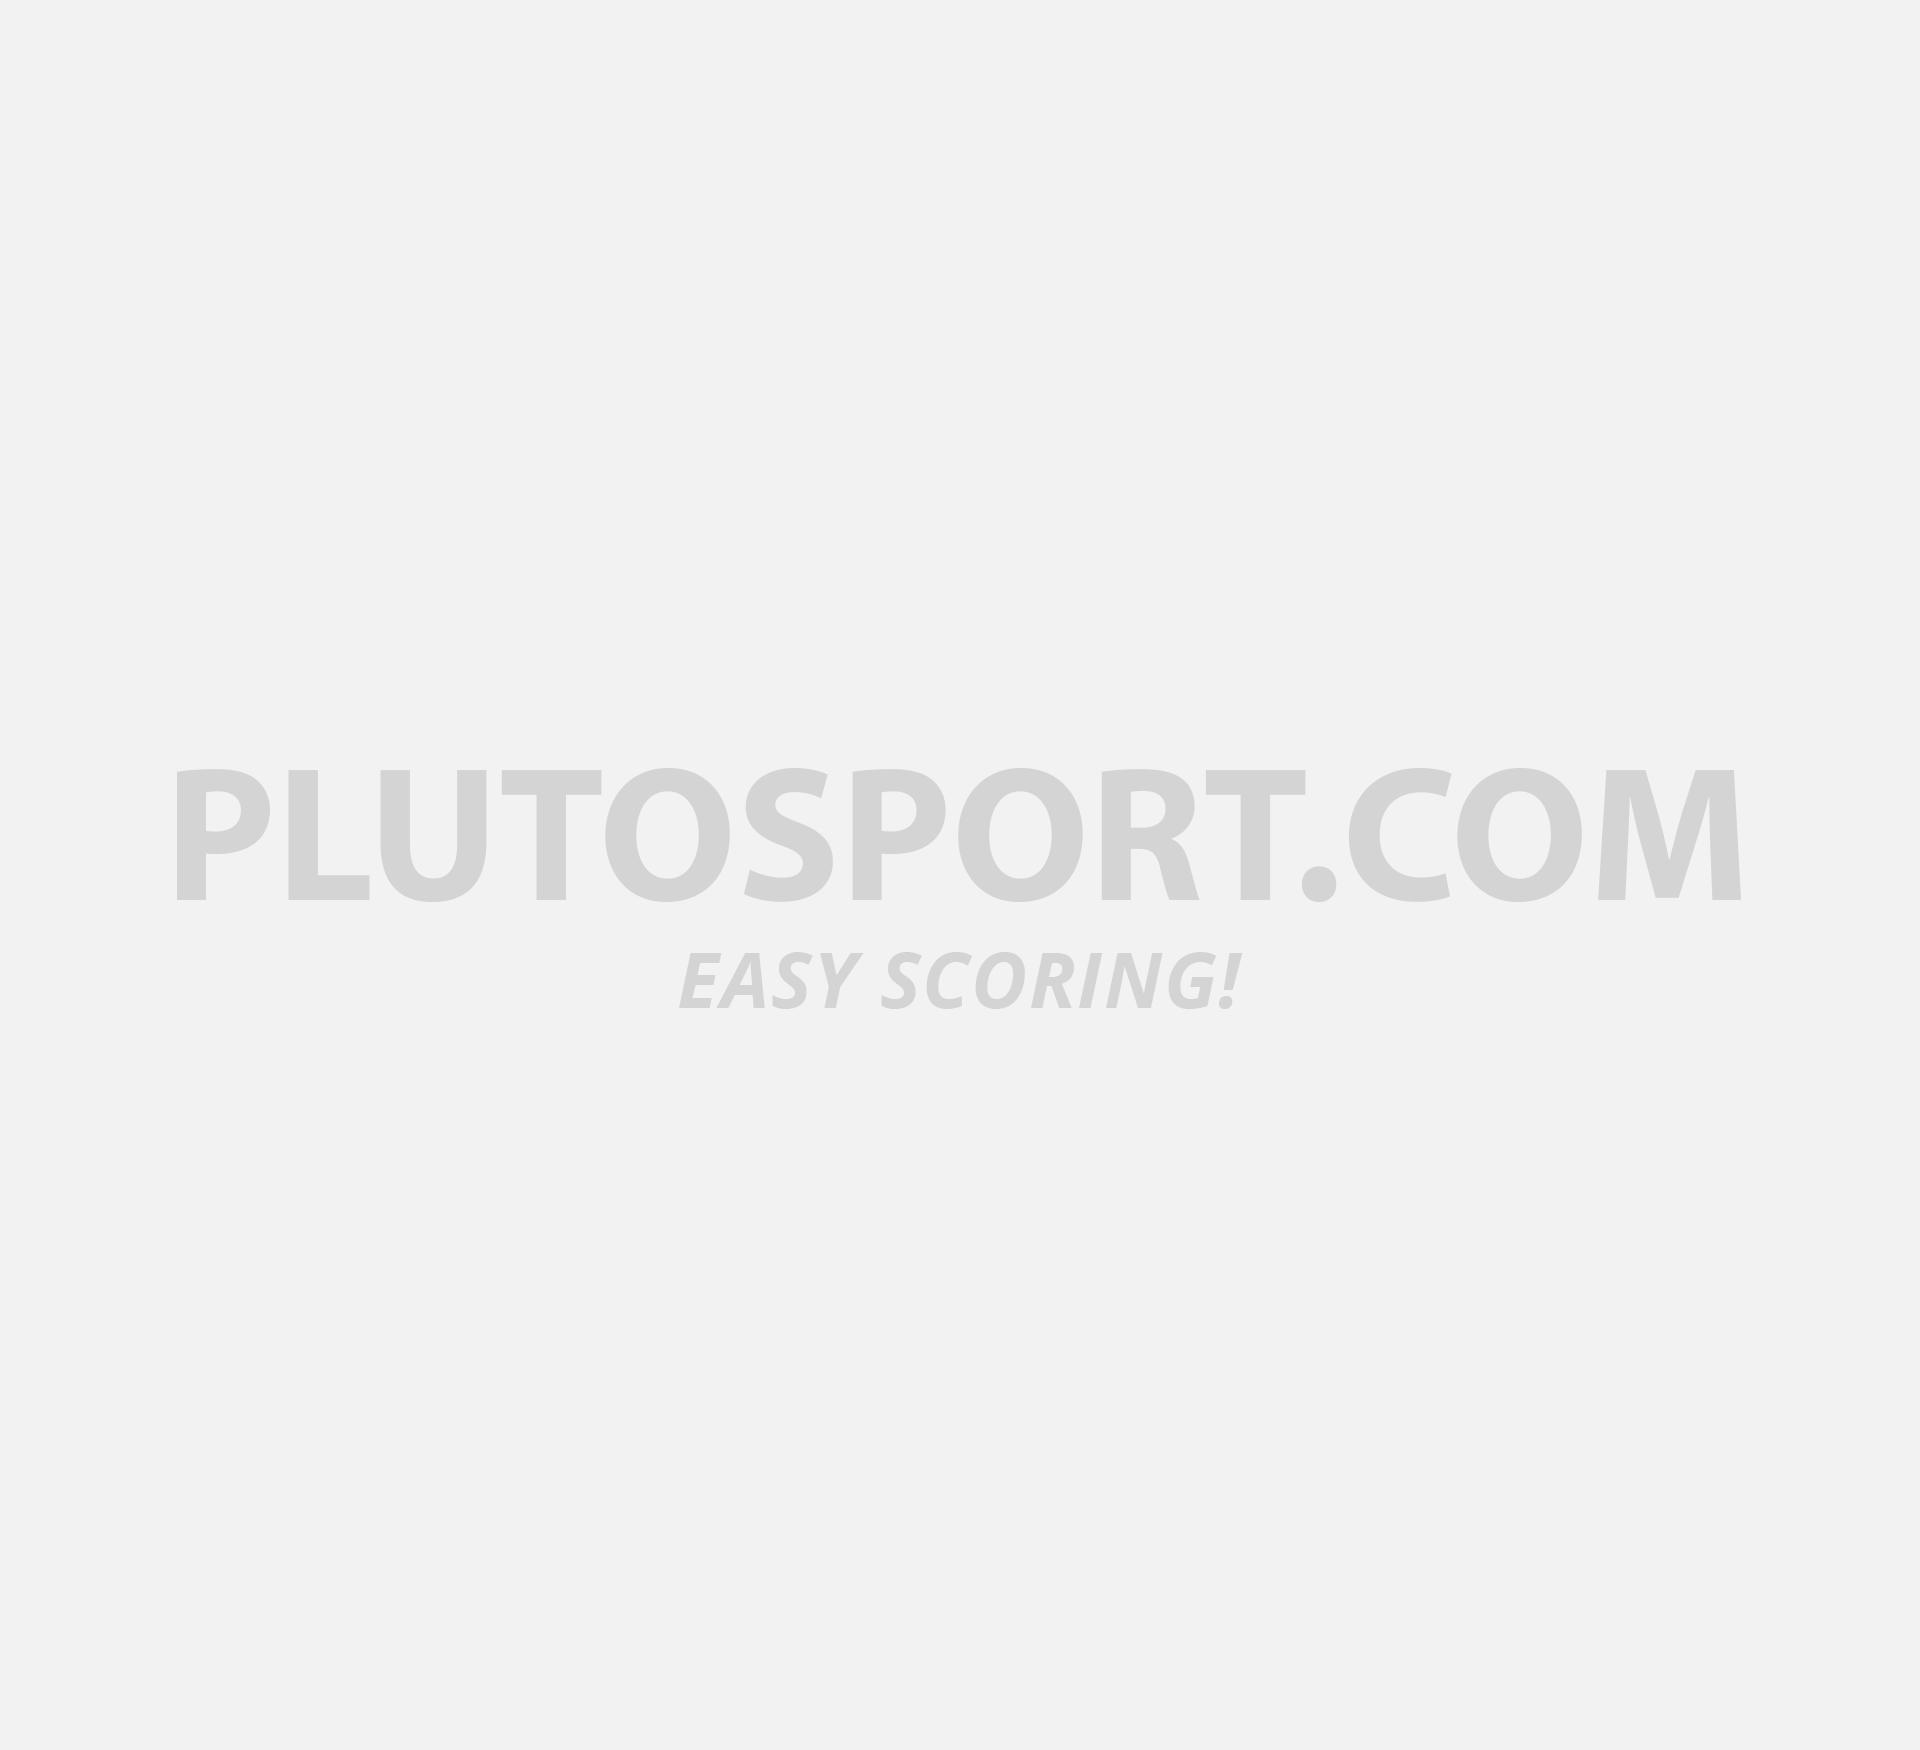 Sportec Ballbag